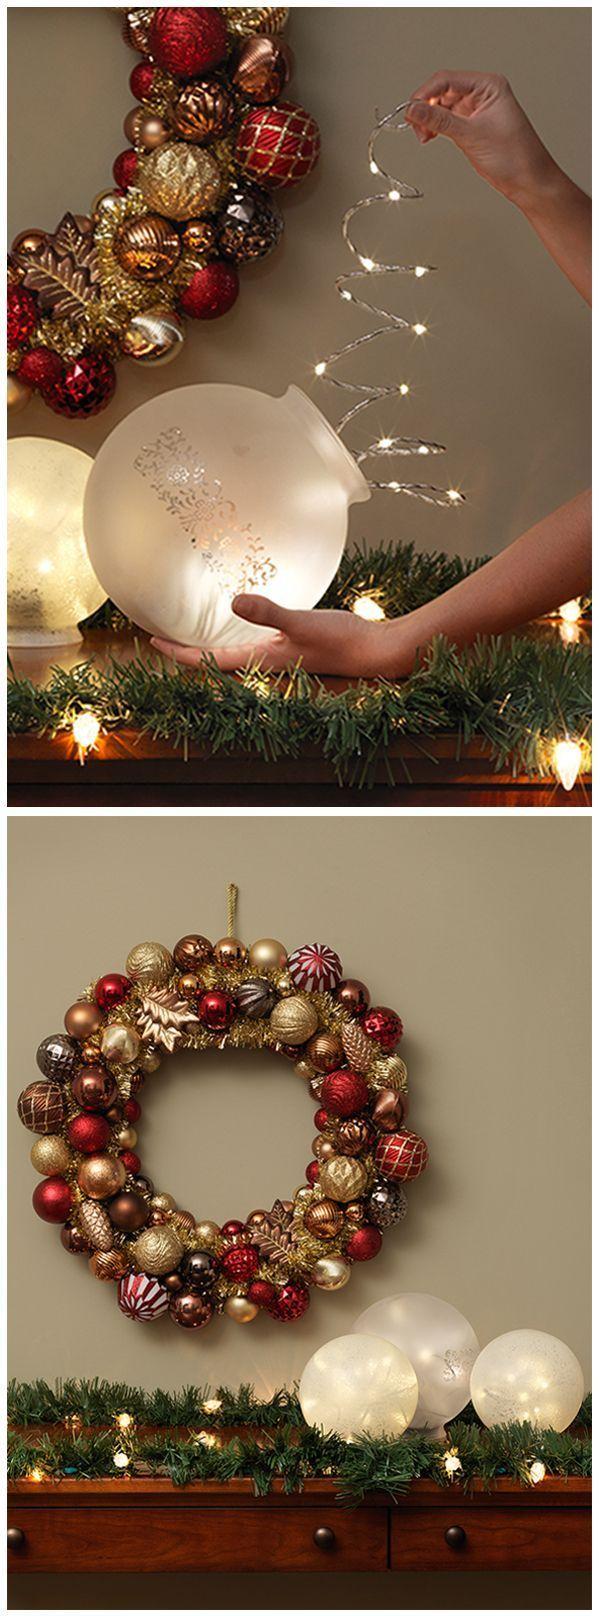 15 wonderful diy ideas for your living room 2 globe lights globe globe light winter luminaries by the home depot via remodelaholic solutioingenieria Images